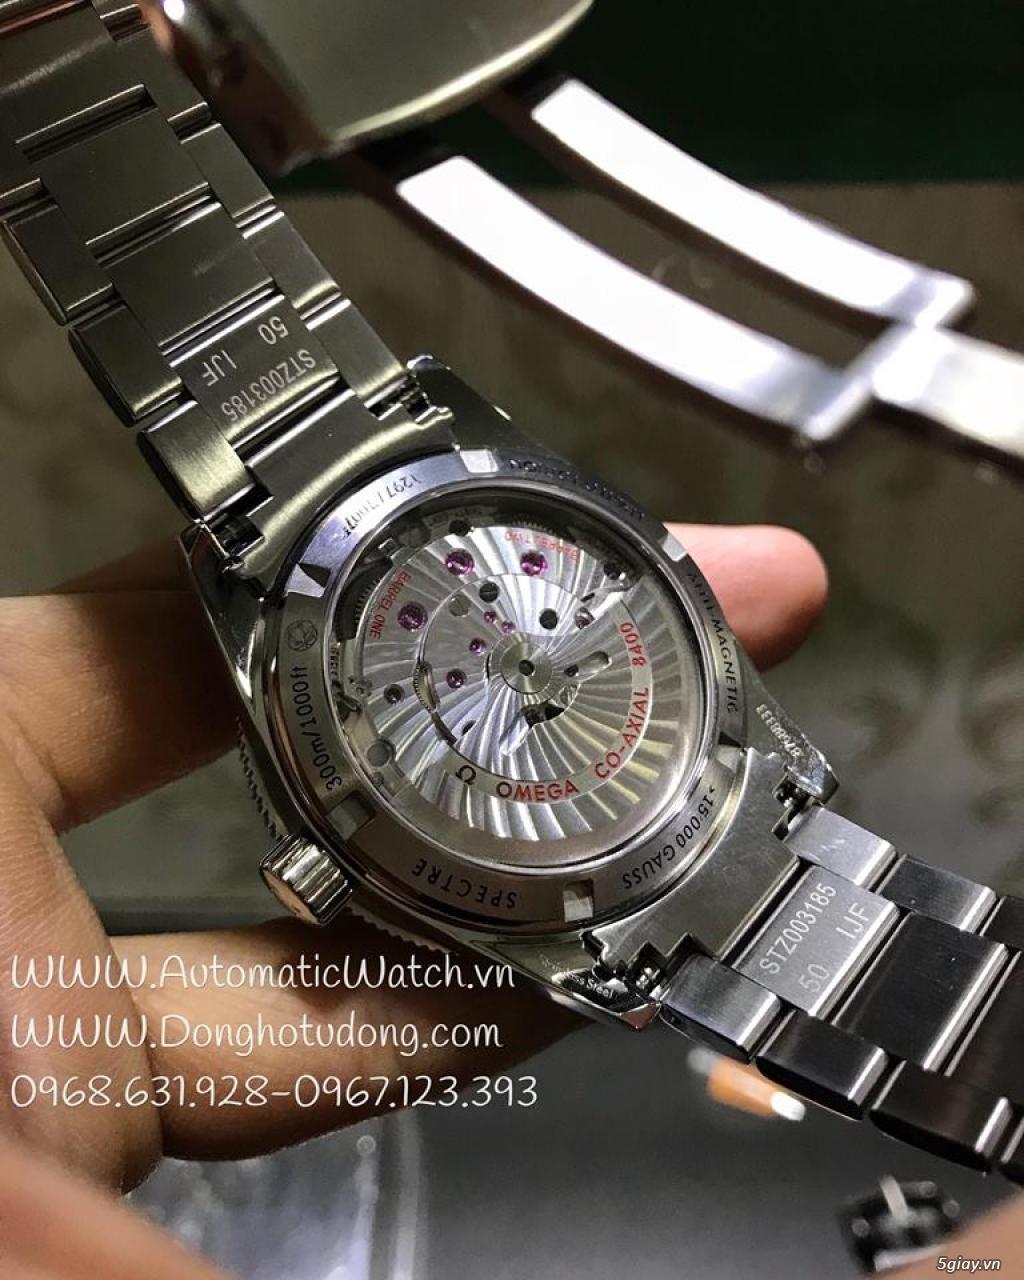 Chuyên đồng hồ Rolex,Hublot,AP, Patek Philippe...Replica1:1 Swiss Made - 7